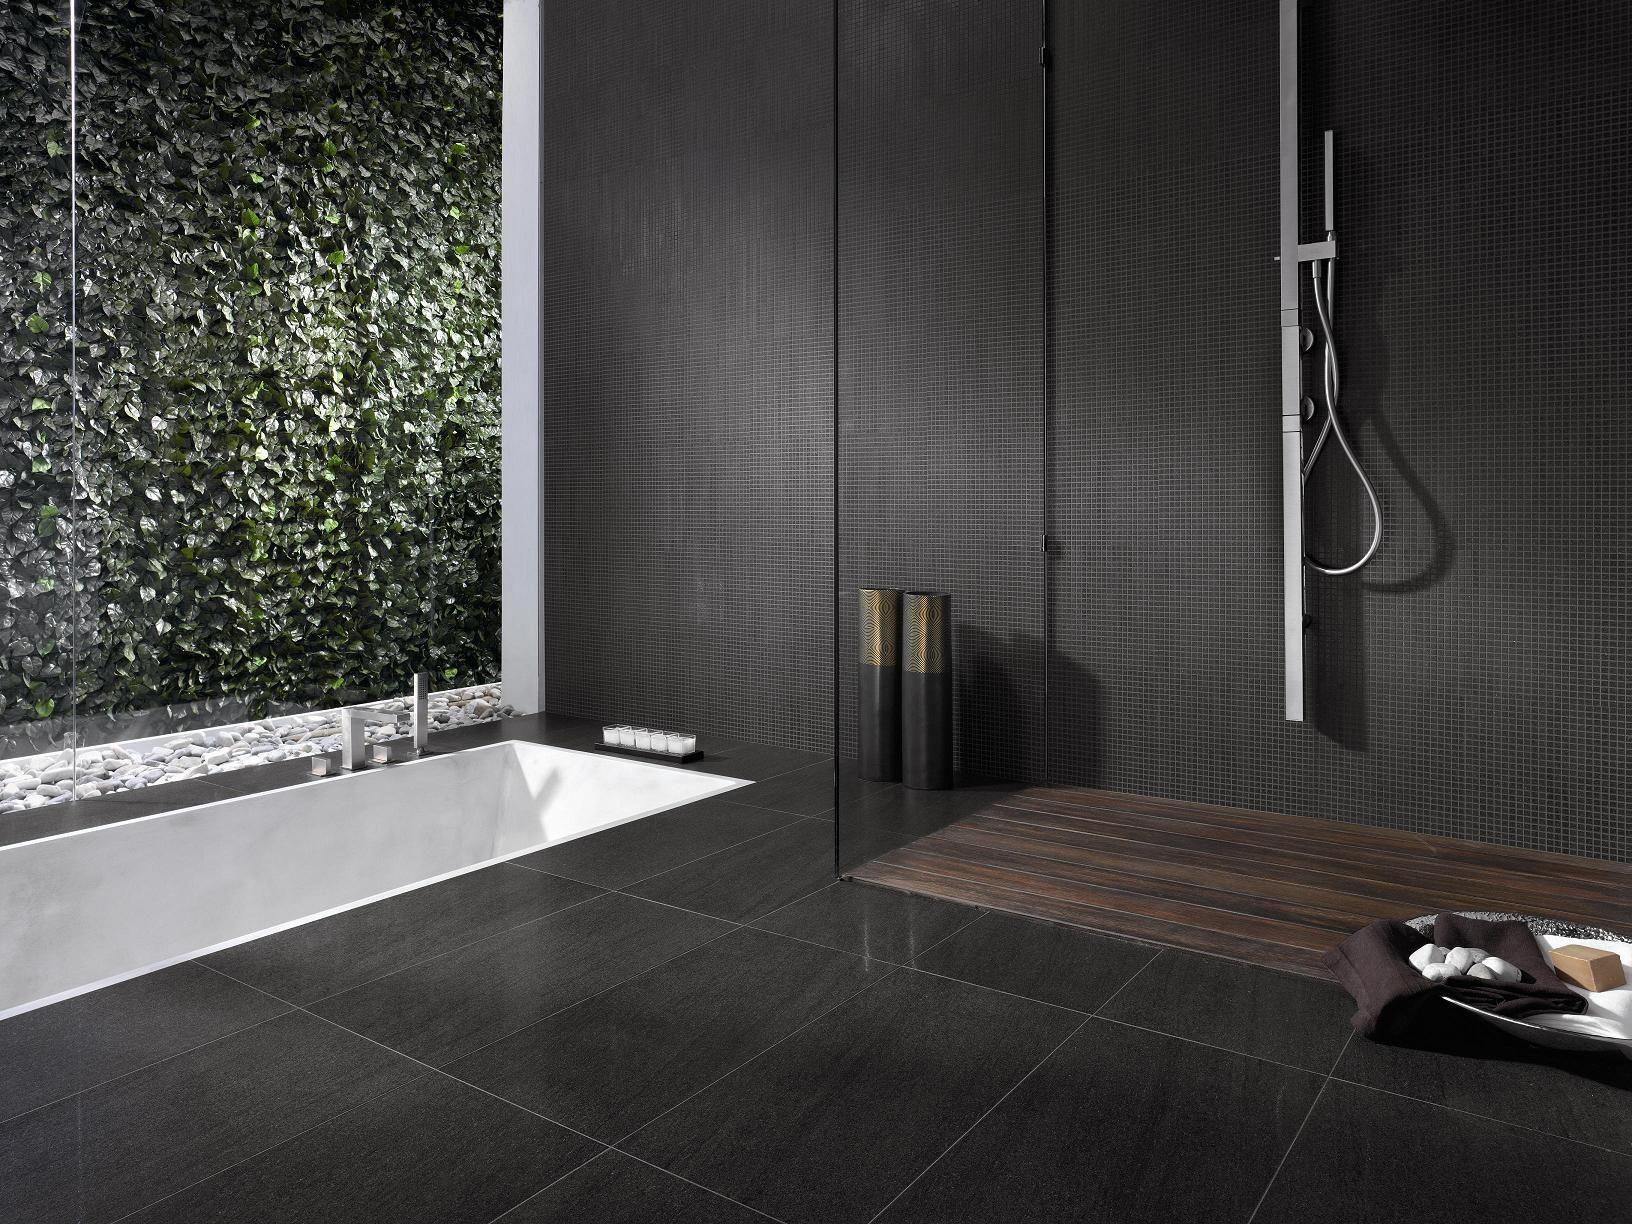 Black Is Back Http Www Pivotech Com Au Less Is More With Minimalist Bathroom Design Minimalist Bathroom Stone Bathroom Black Tile Bathrooms